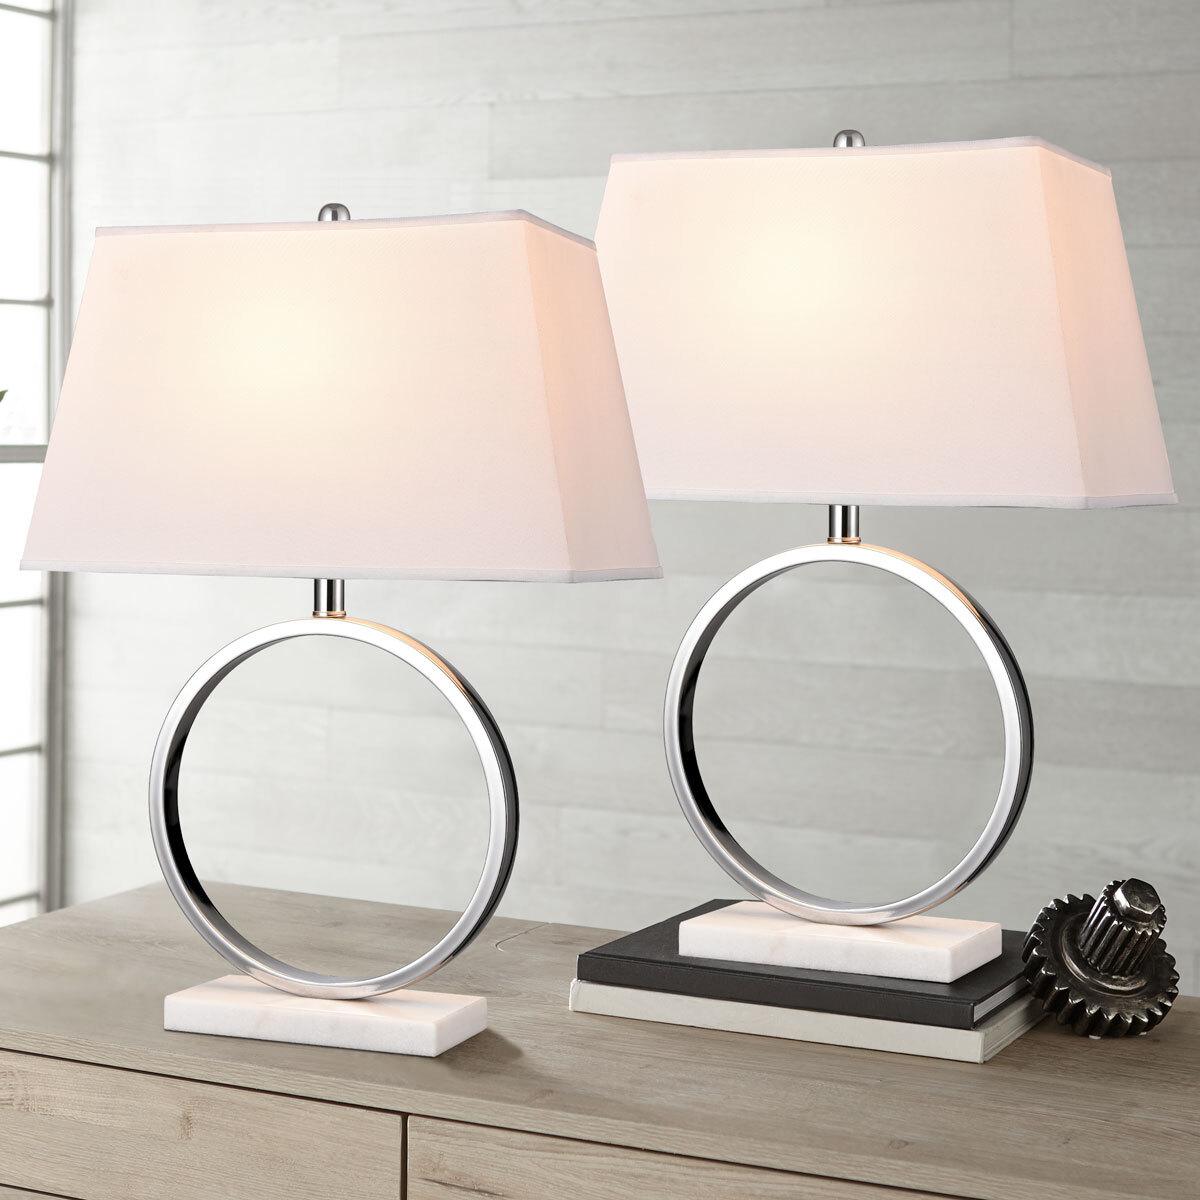 Bridgeport Designs Marble Table Lamp 2 Pack Costco Uk